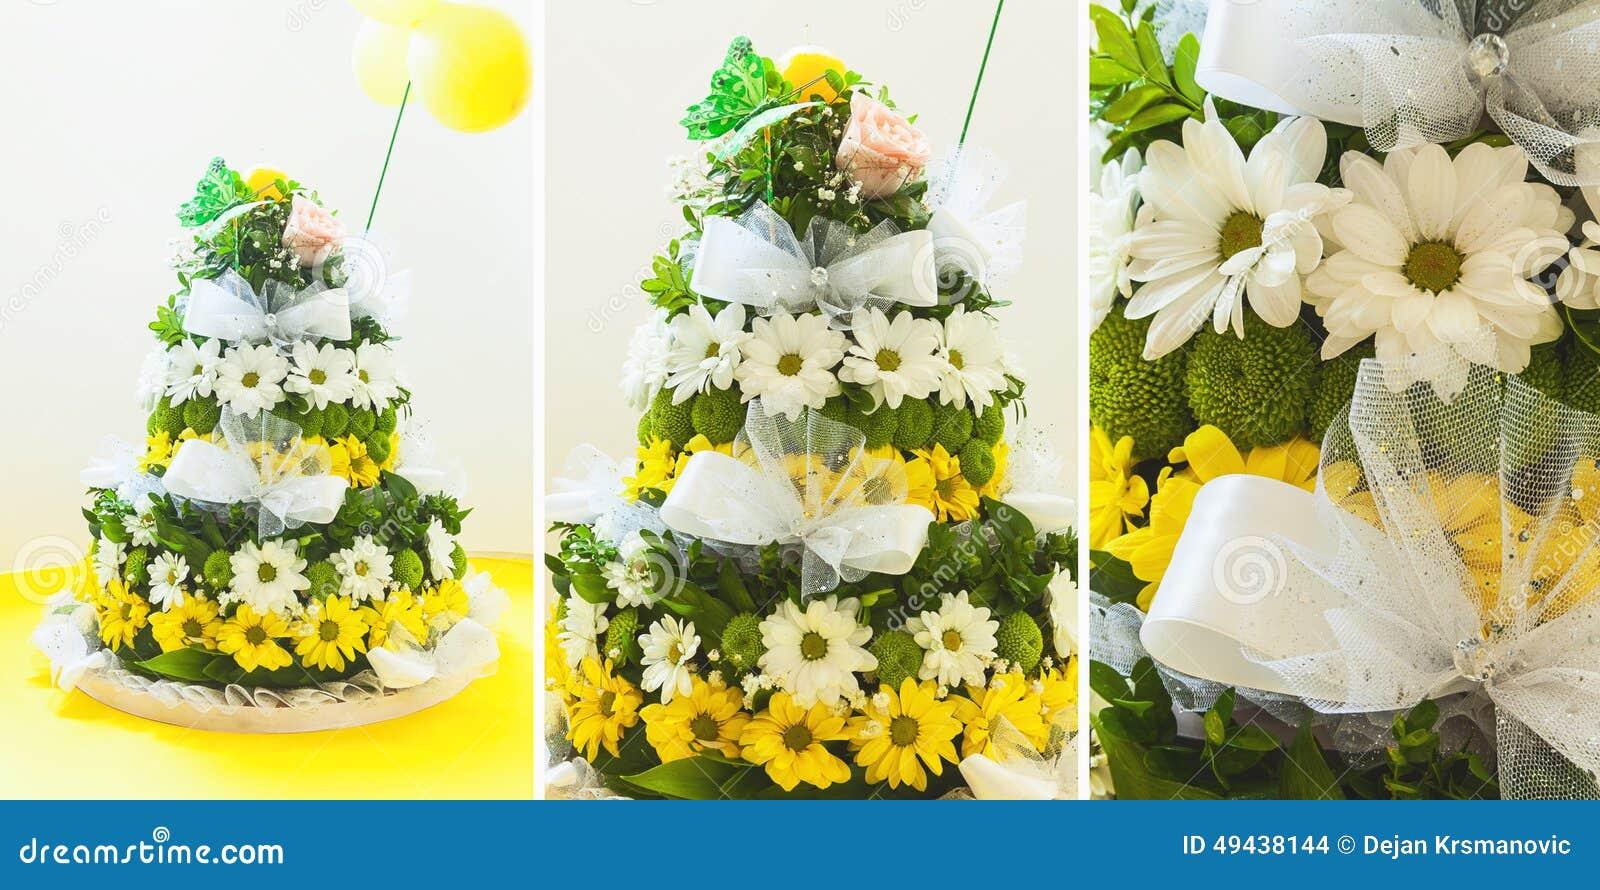 Flower arrangement stock photo image of ceremony birthday 49438144 download flower arrangement stock photo image of ceremony birthday 49438144 izmirmasajfo